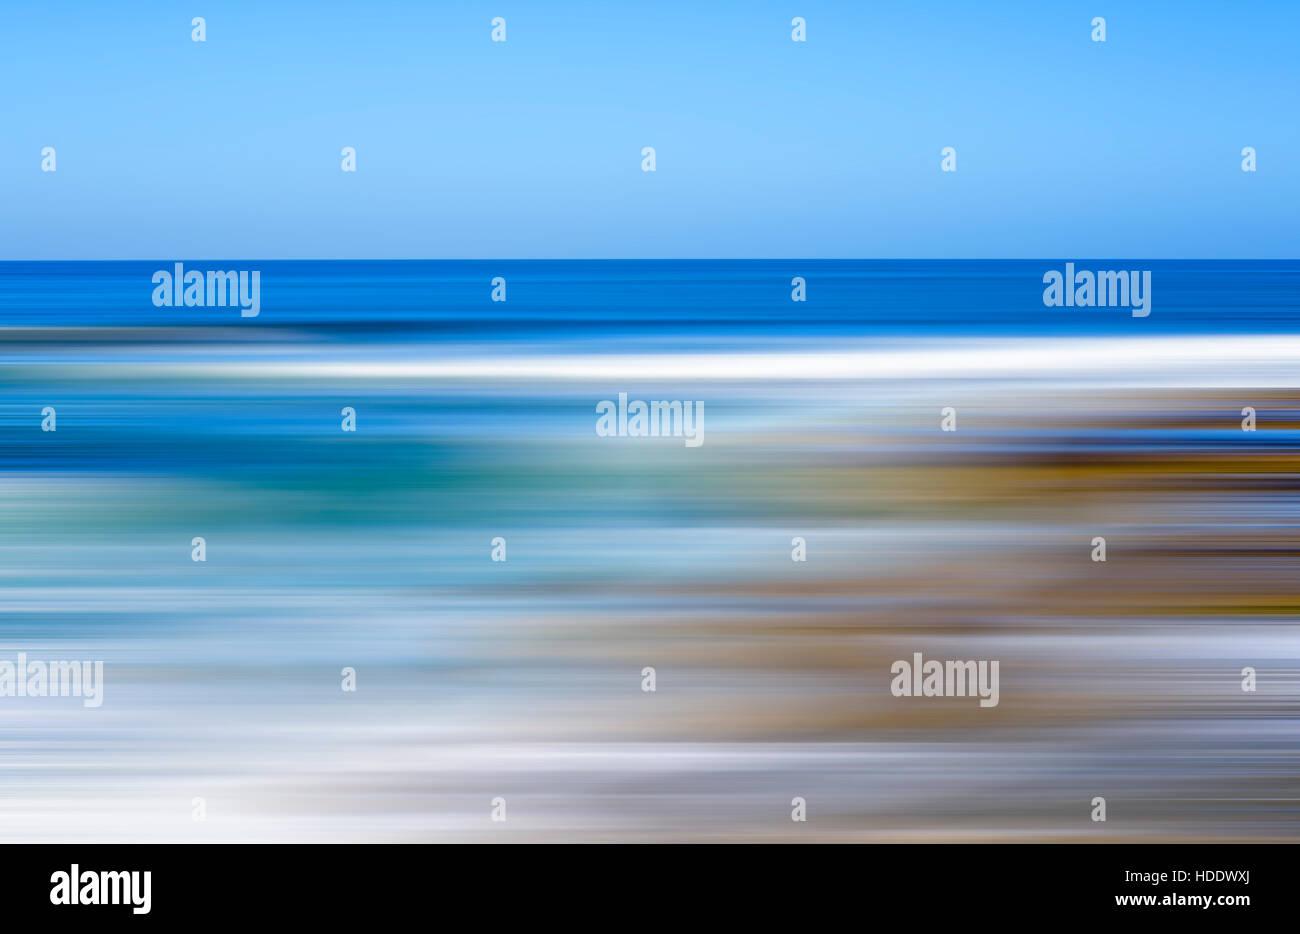 beach and ocean view, motion blur, defocused sea. - Stock Image